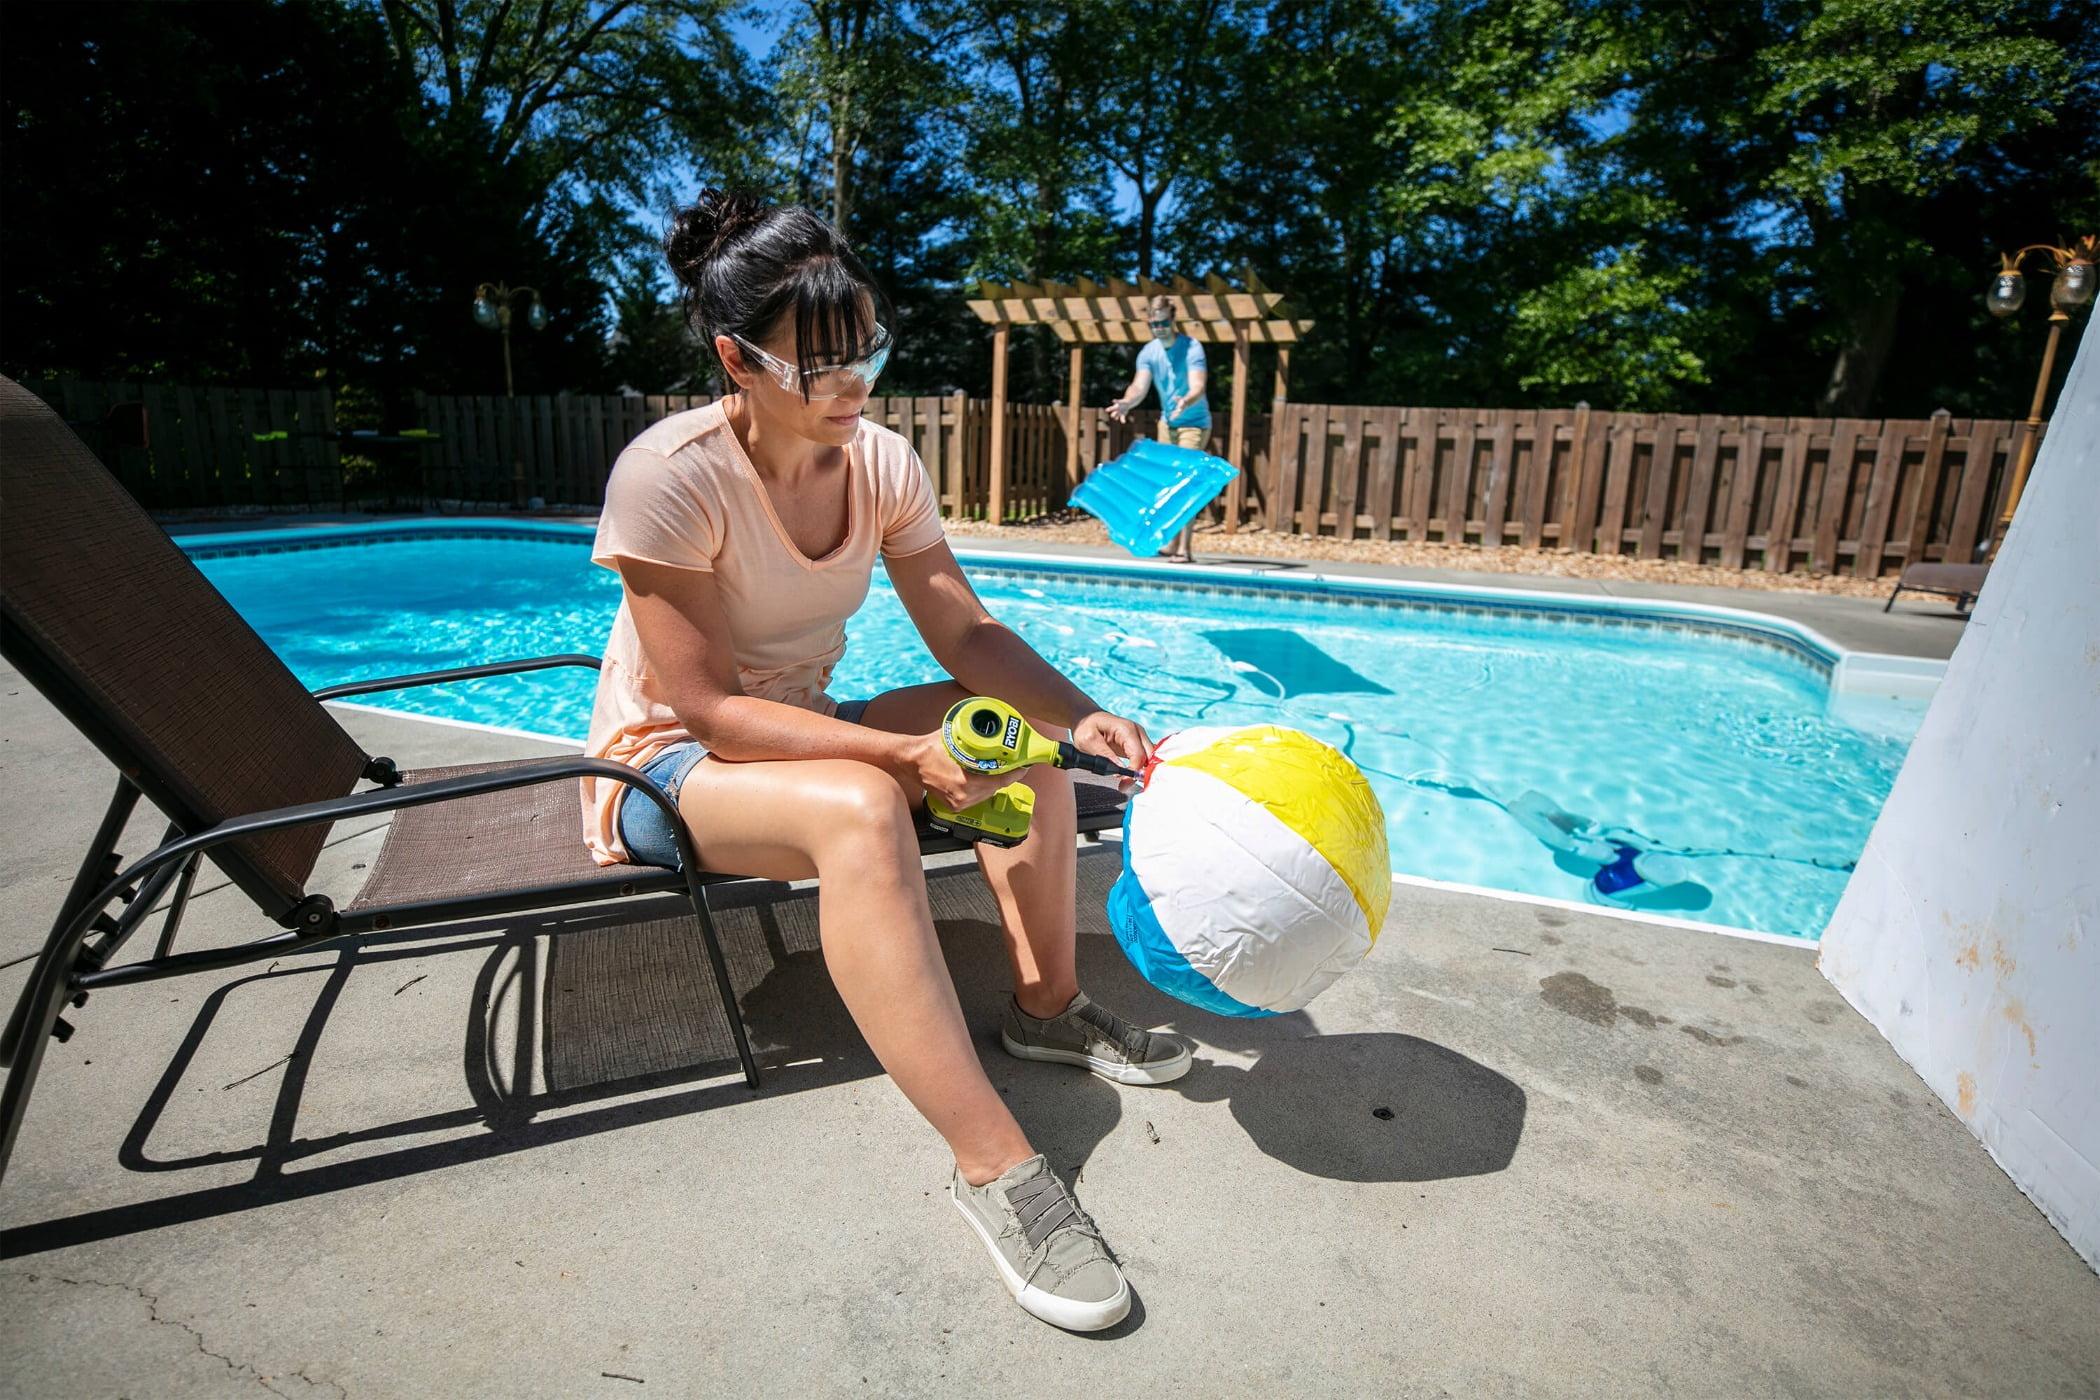 Swimming pool, Outdoor furniture, Water, Leg, Tree, Shorts, Thigh, Leisure, Sunlounger, Ball